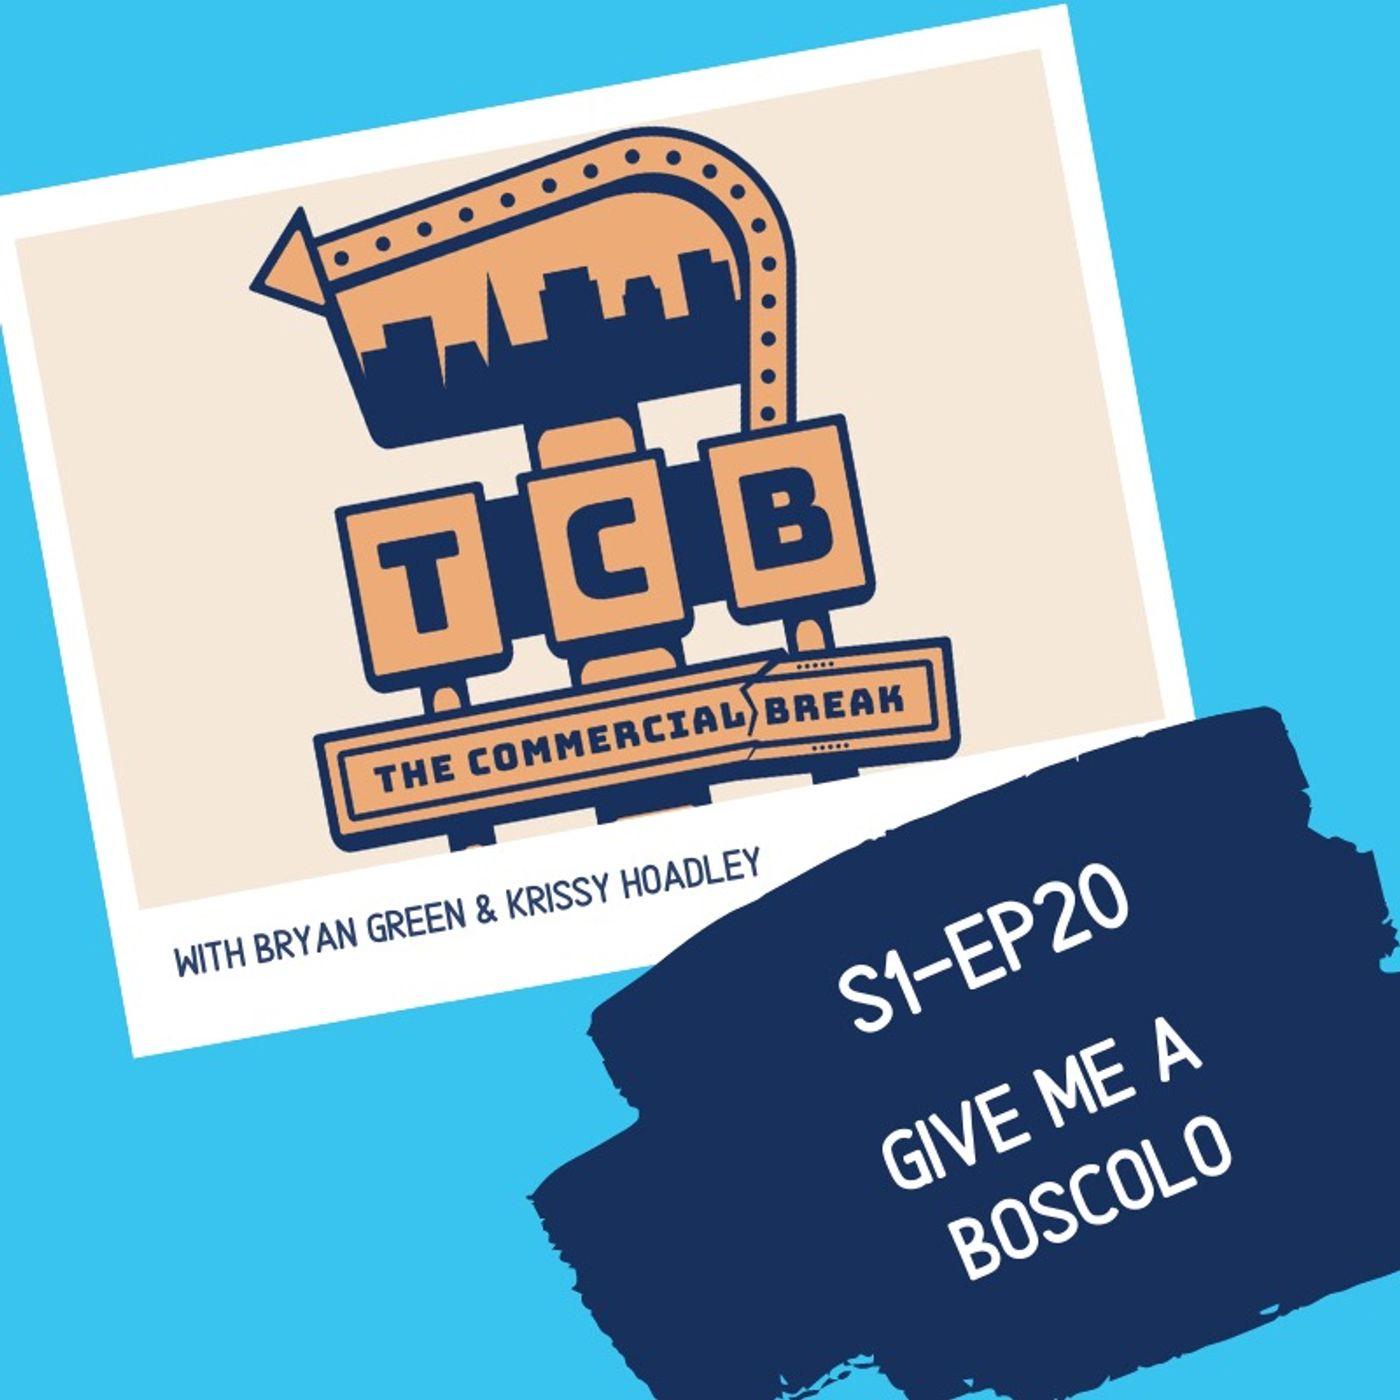 S1-EP20: Give Me A Boscolo